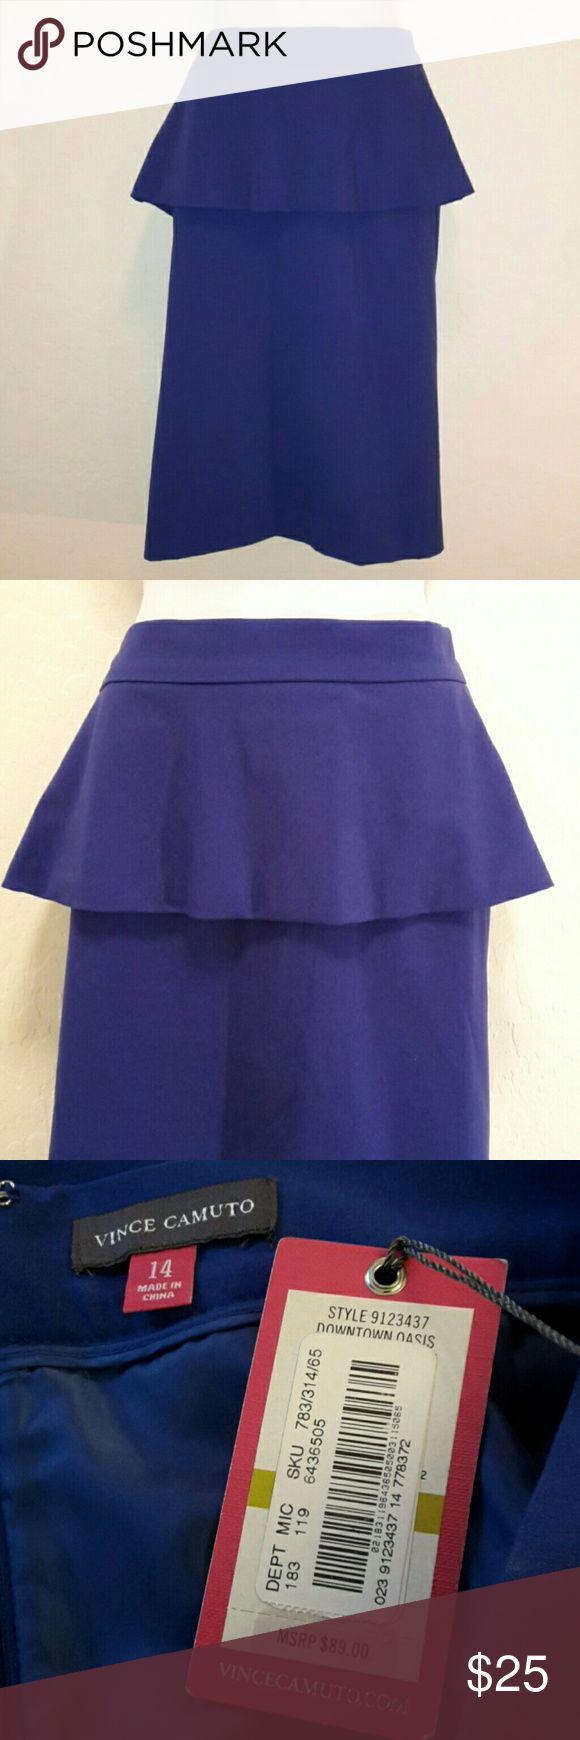 NWT Vince Camuto Royal Blue Peplum Skirt Gorgeous Color, Stretch, Back Zipper, Knee Length. Skirts